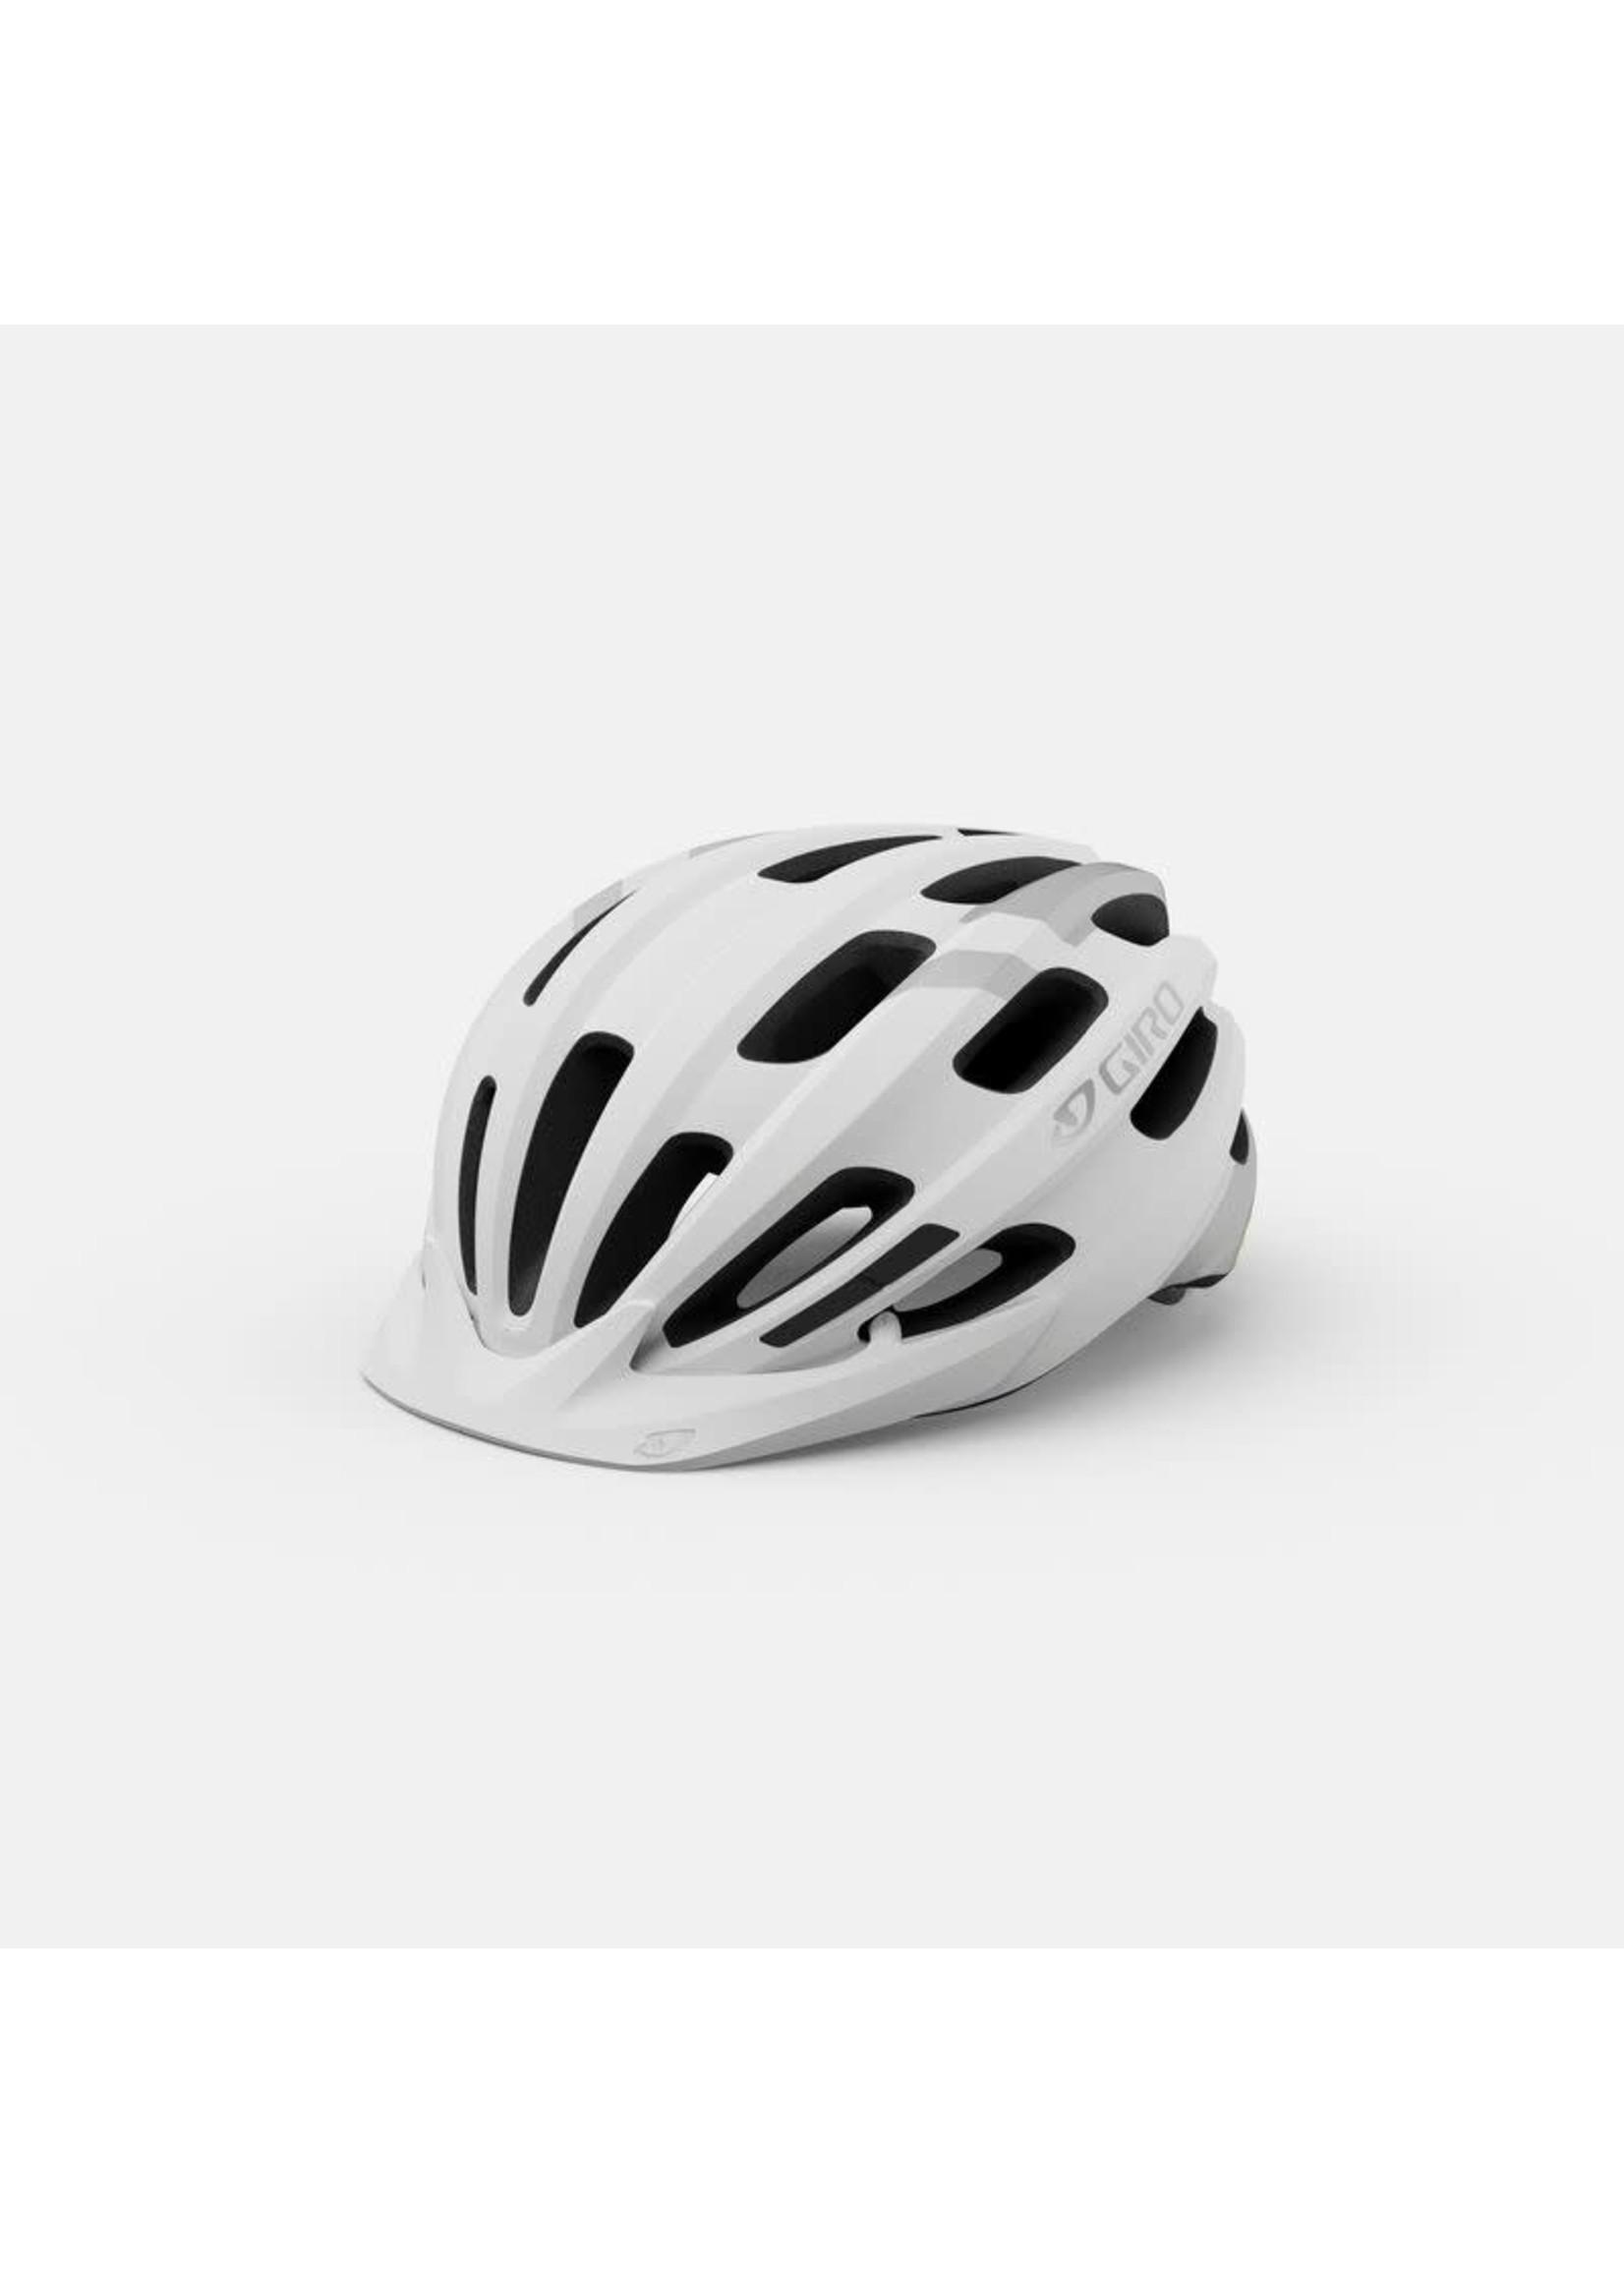 Giro Cycling Giro Register MIPS Adult Recreational Bike Helmet - Matte White - Size UA (54-61 cm)